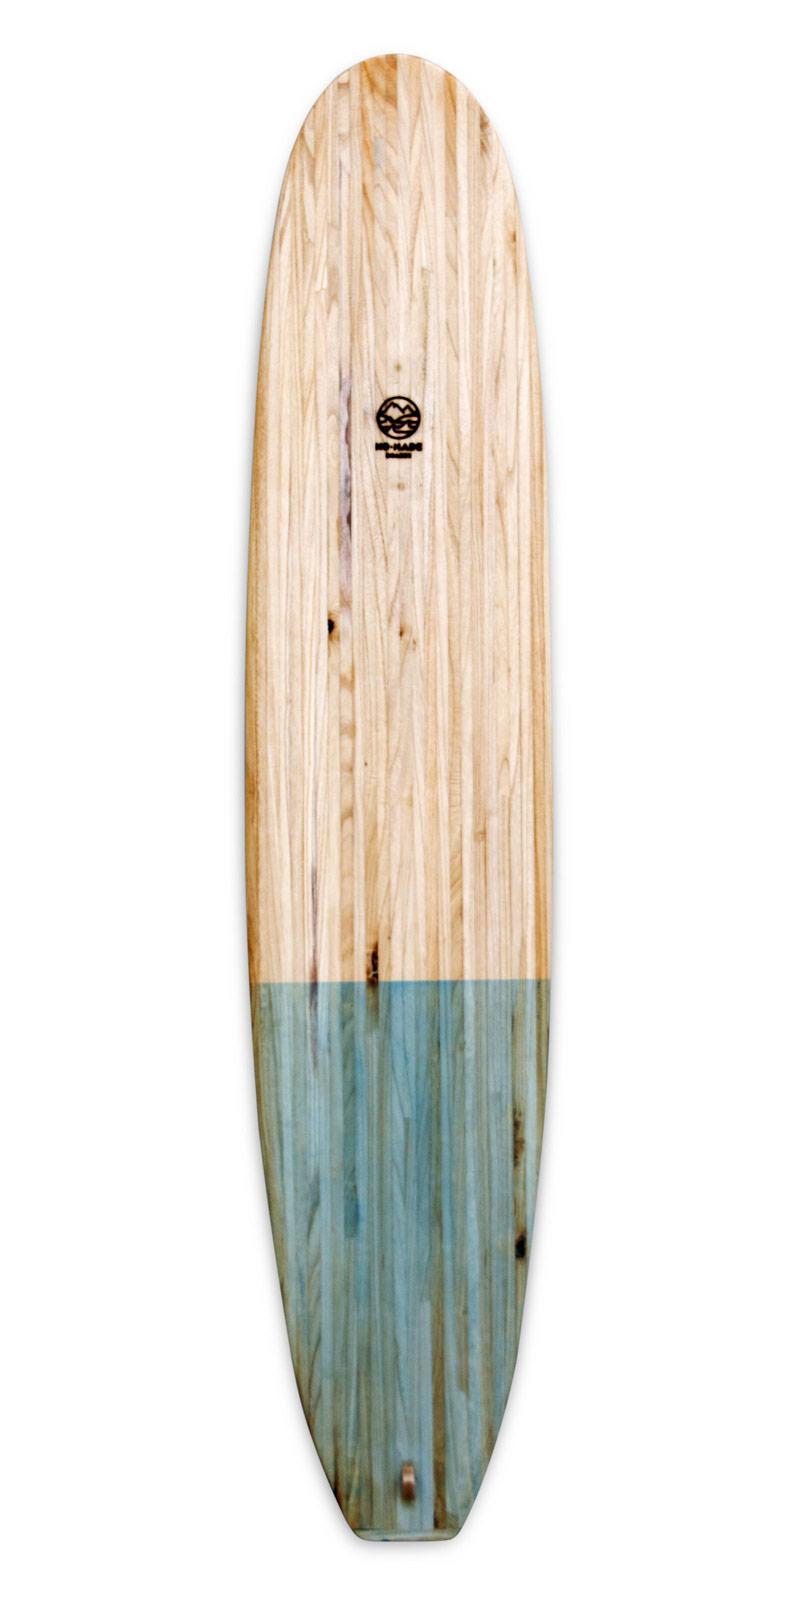 kombu wooden surfboard